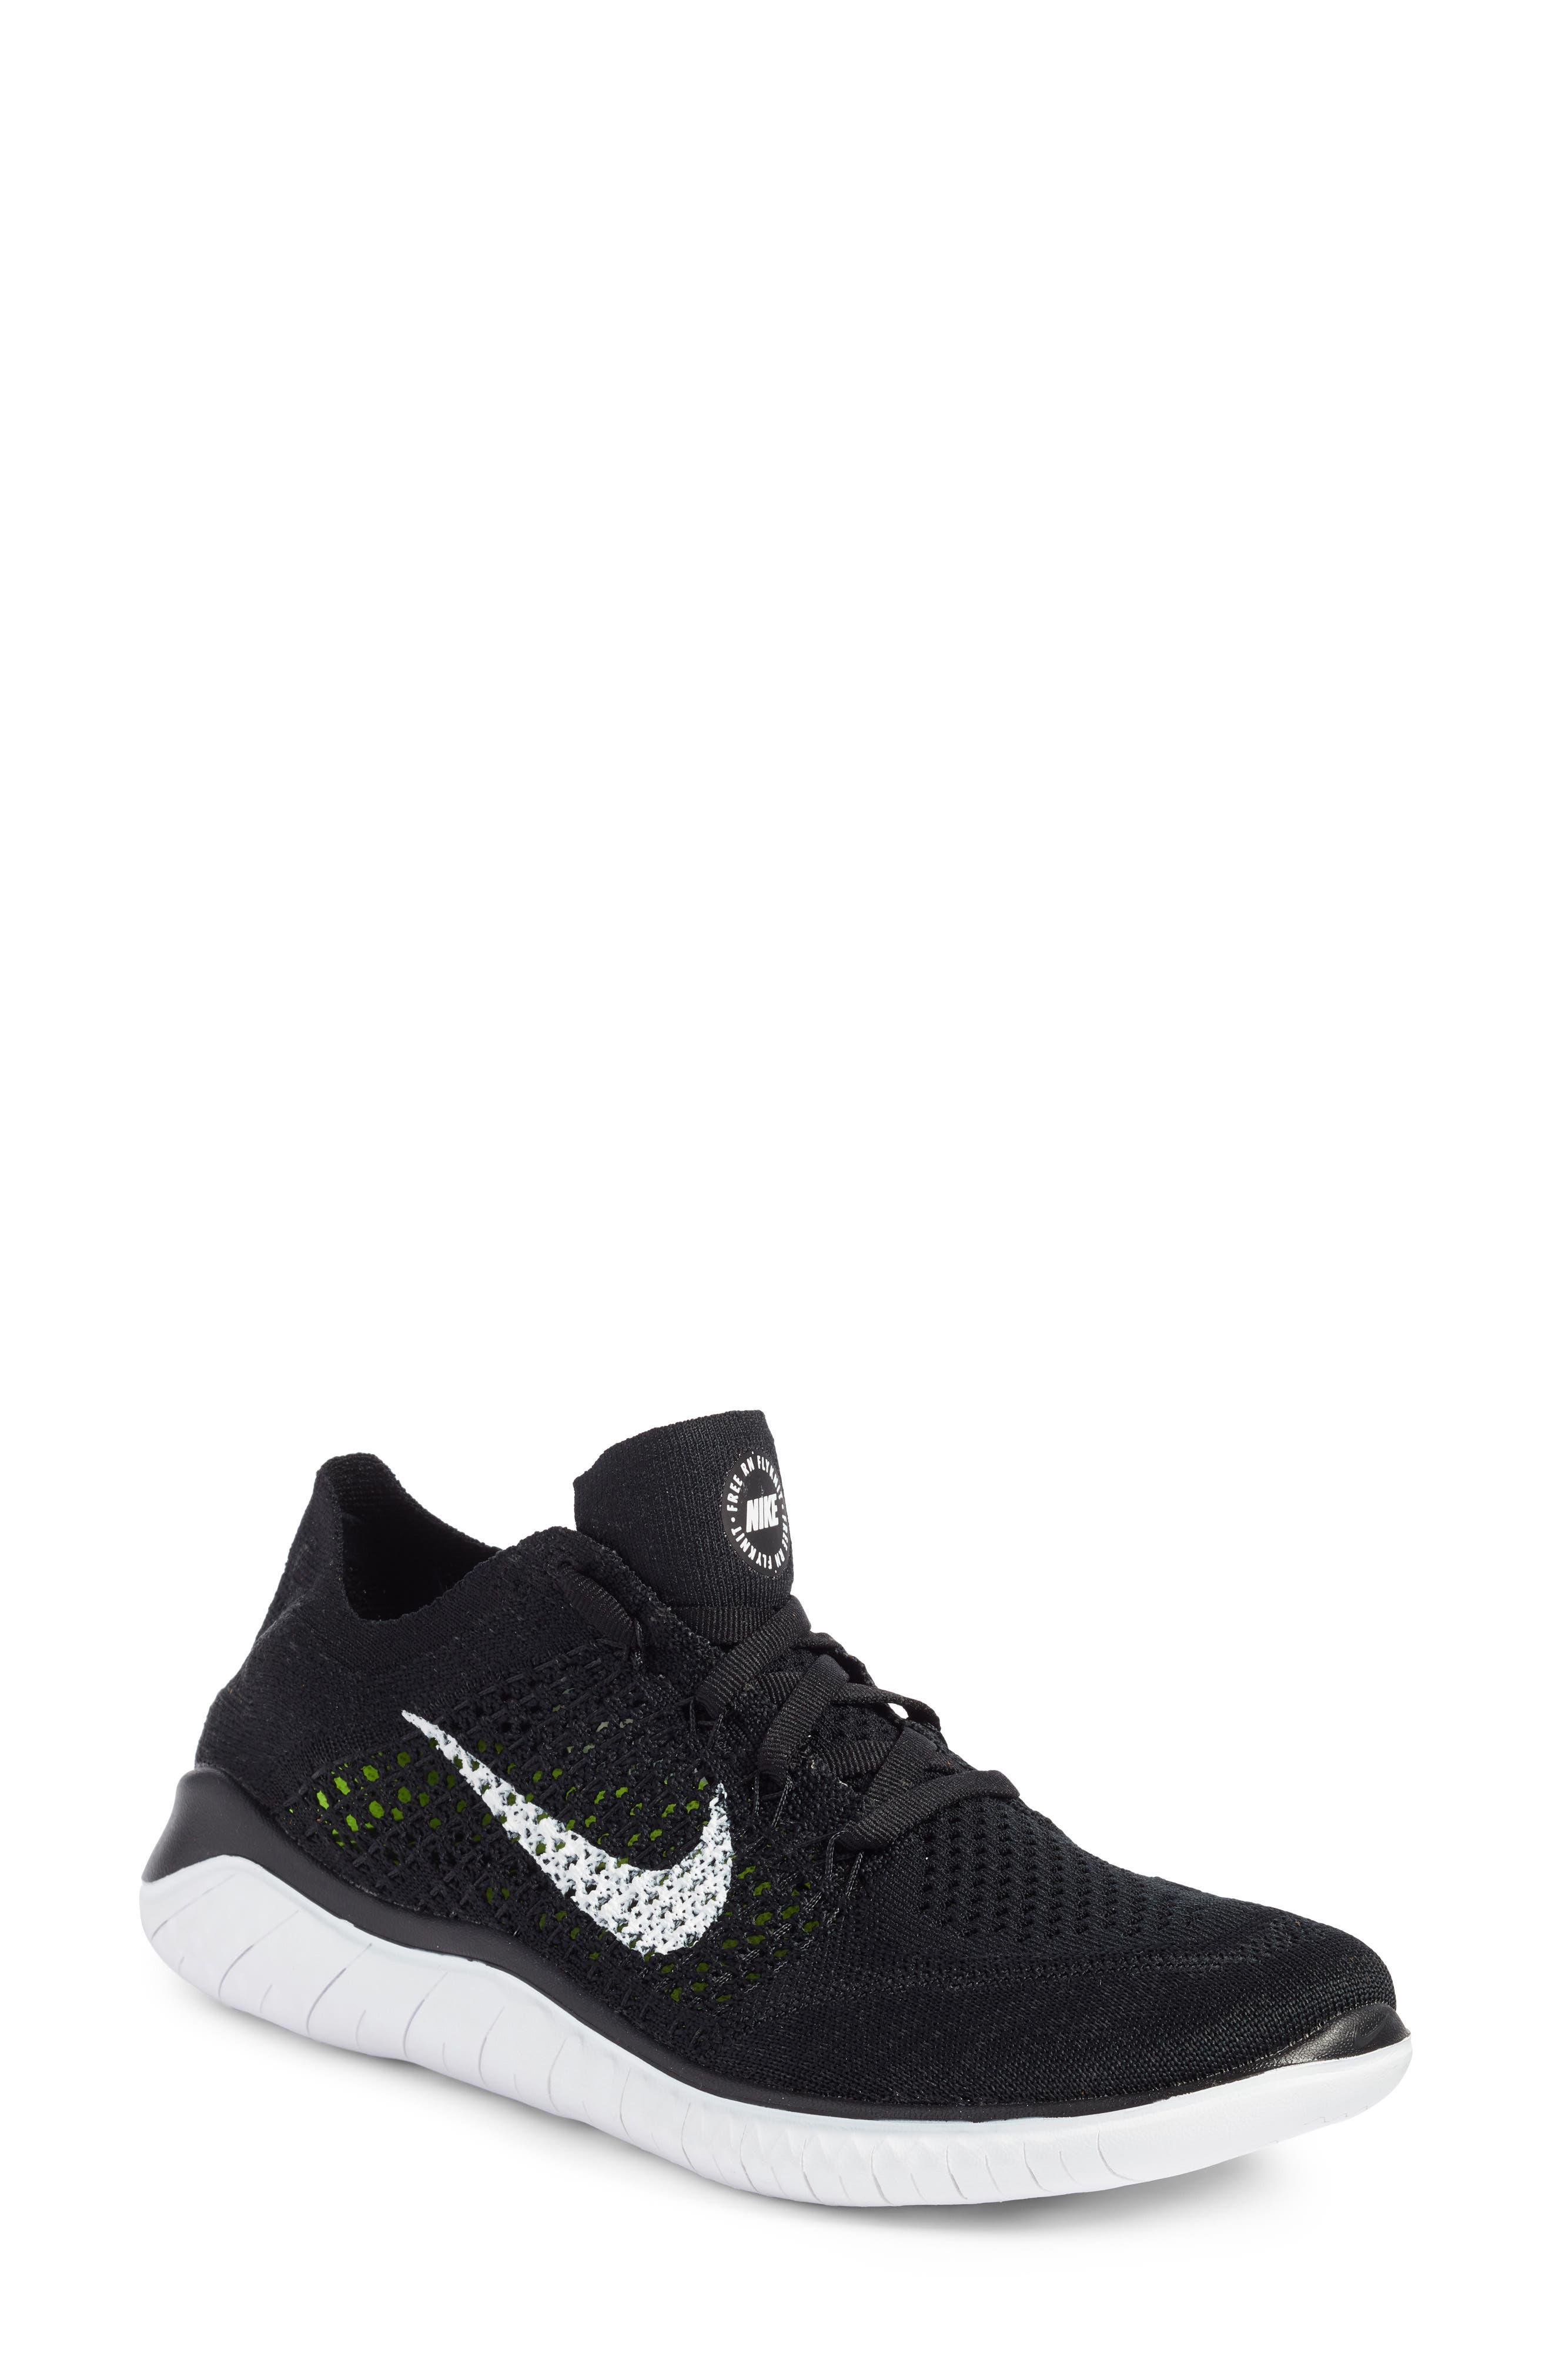 Alternate Image 1 Selected - Nike Free RN Flyknit 2018 Running Shoe (Women)